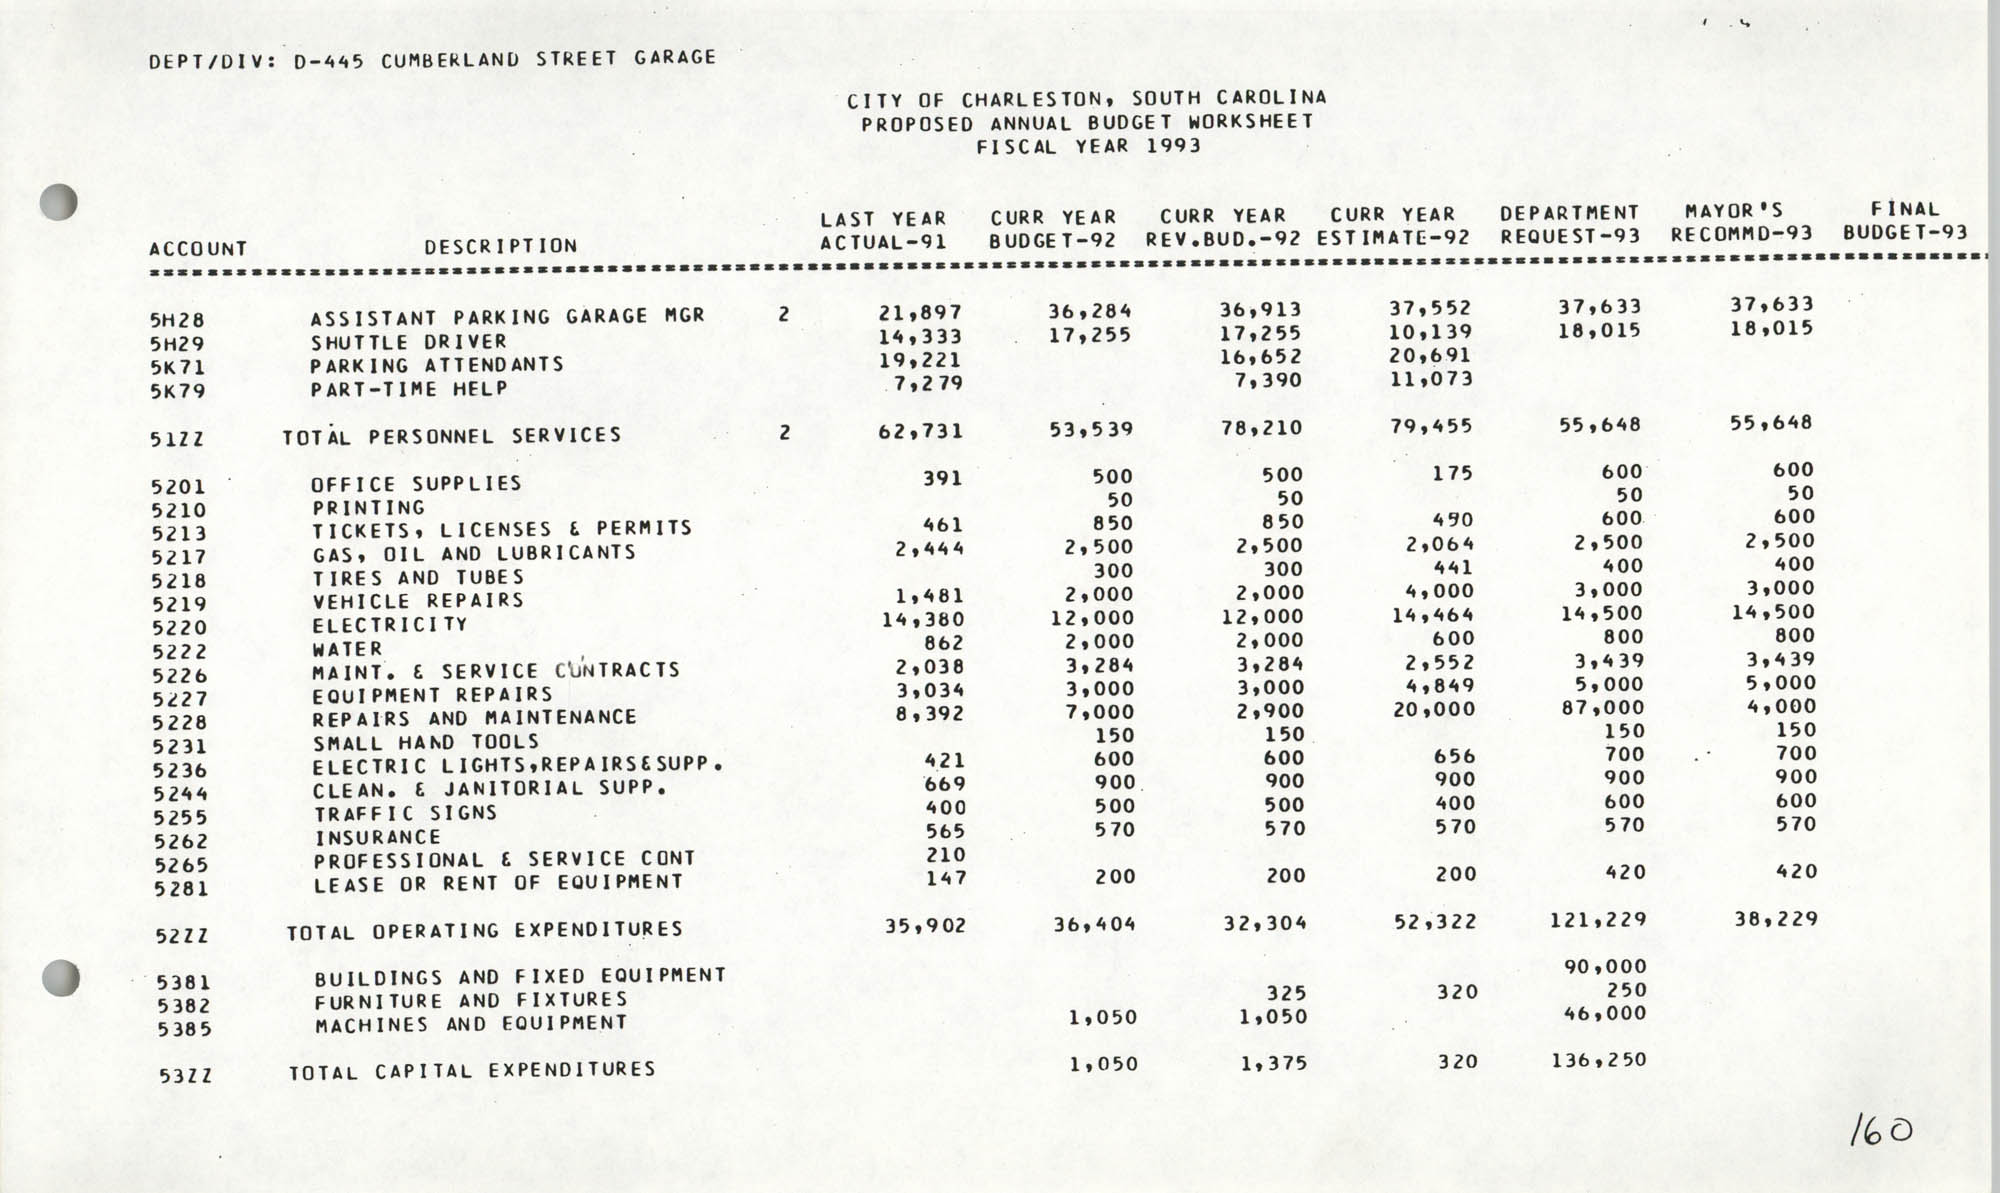 The City Council of Charleston, South Carolina, 1993 Budget, Page 160